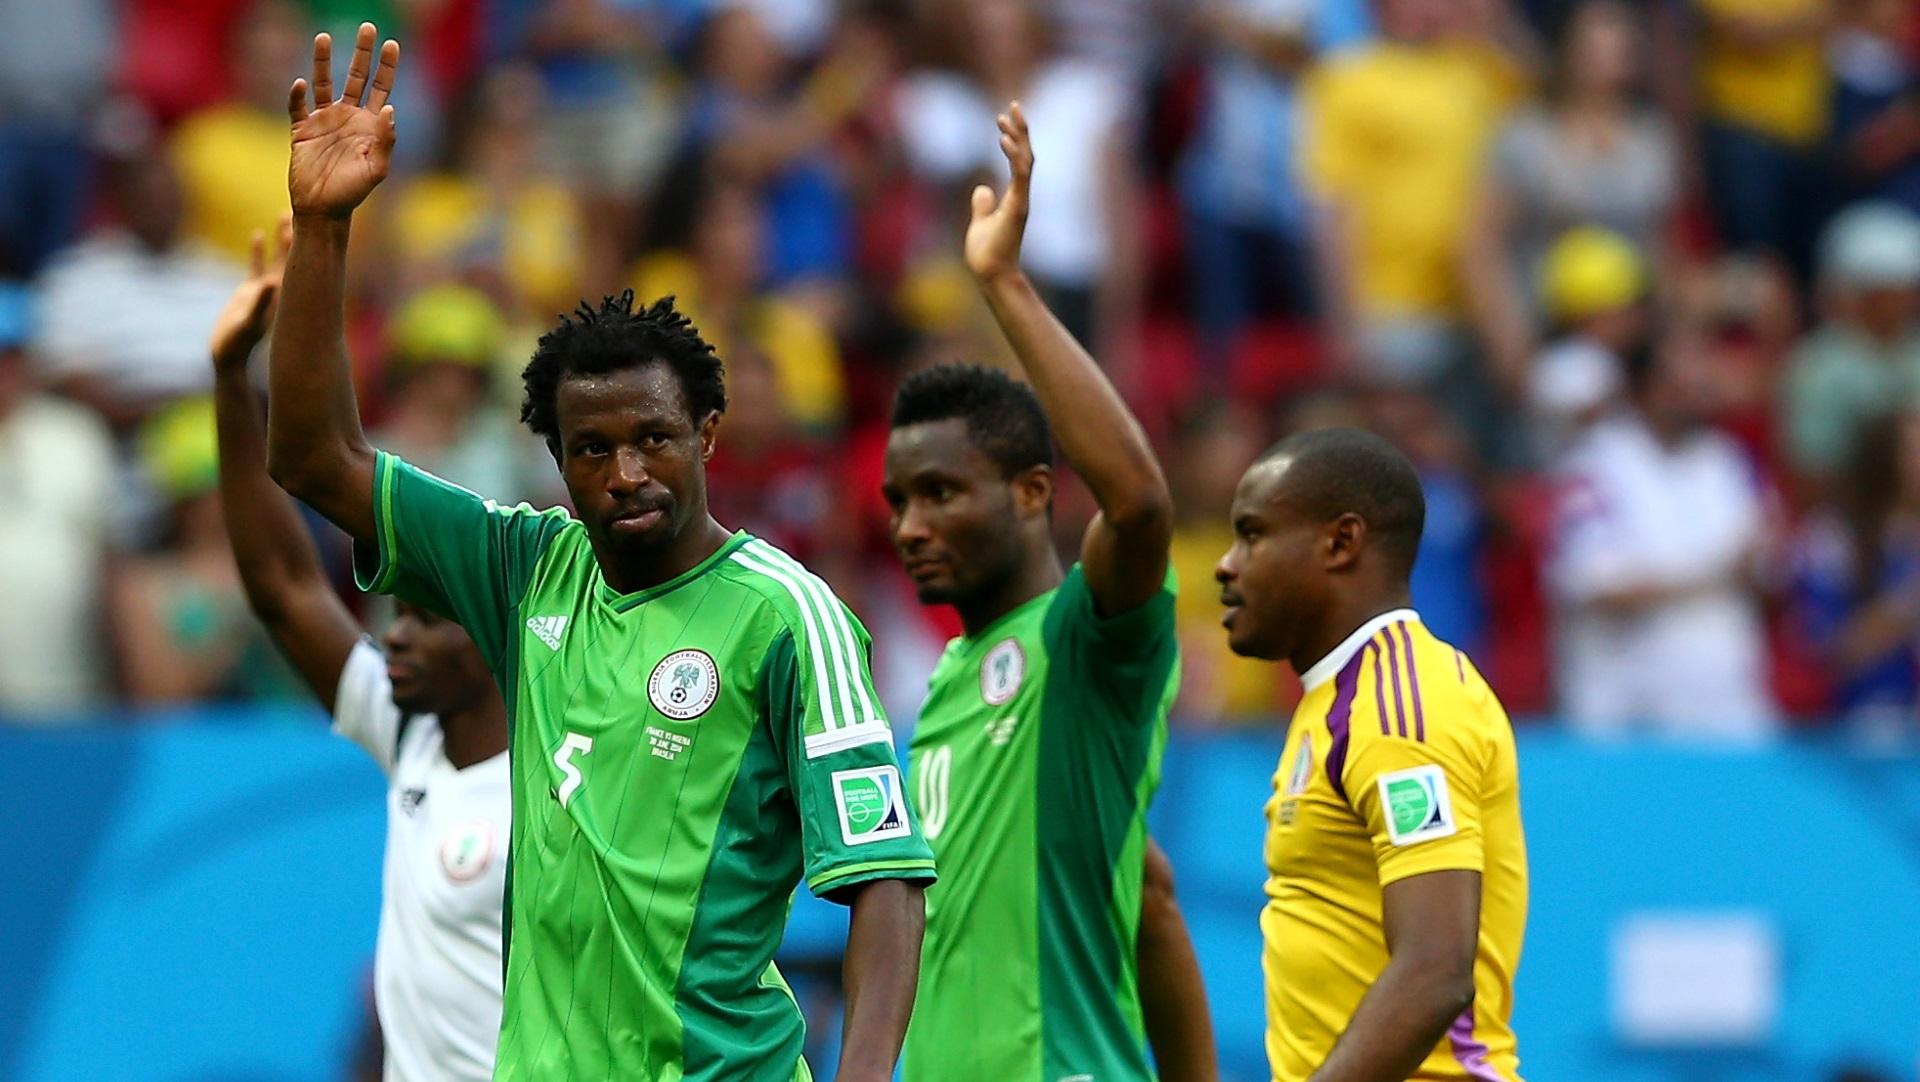 Efe Ambrose, John Obi Mikel, Vincent Enyeama of Nigeria